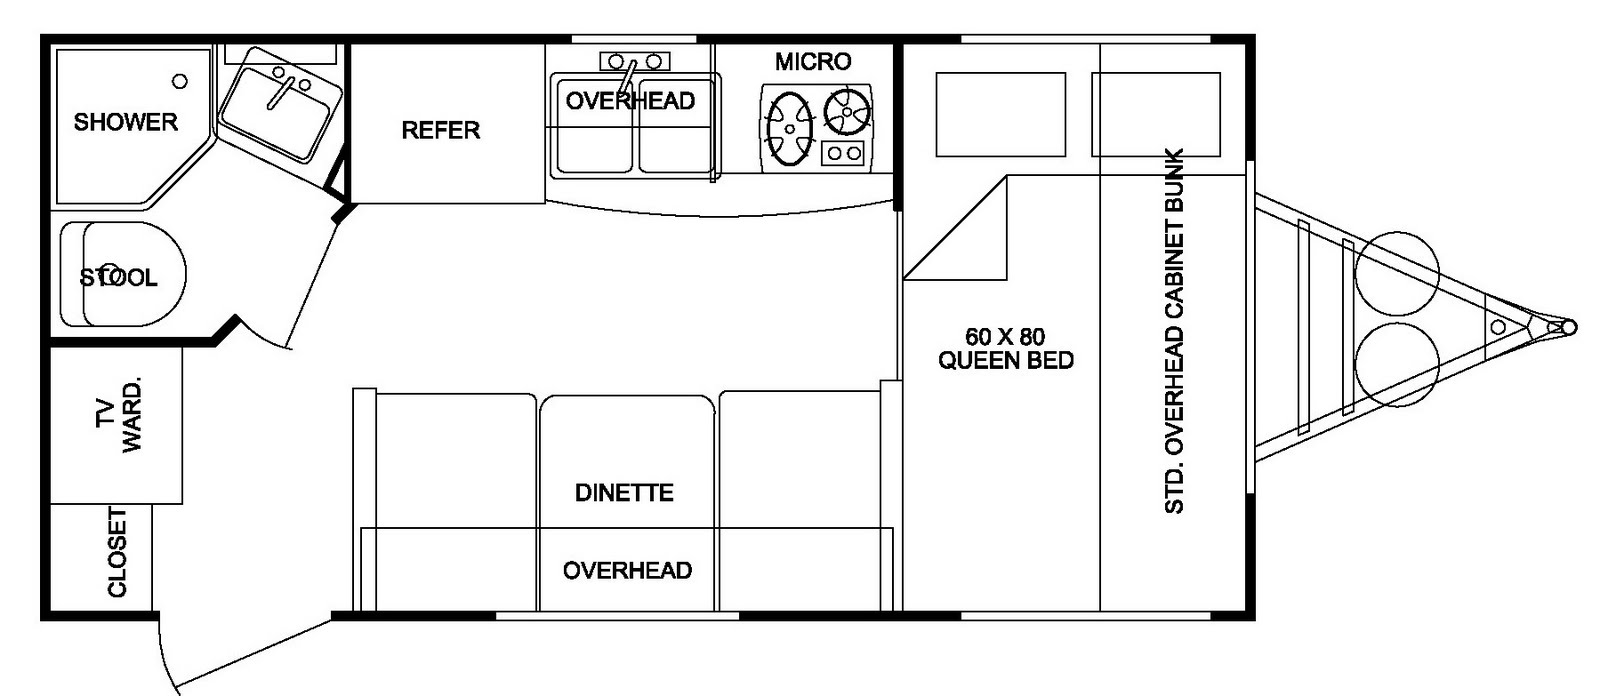 2007 fun finder for sale floor plan for Floor plan finder